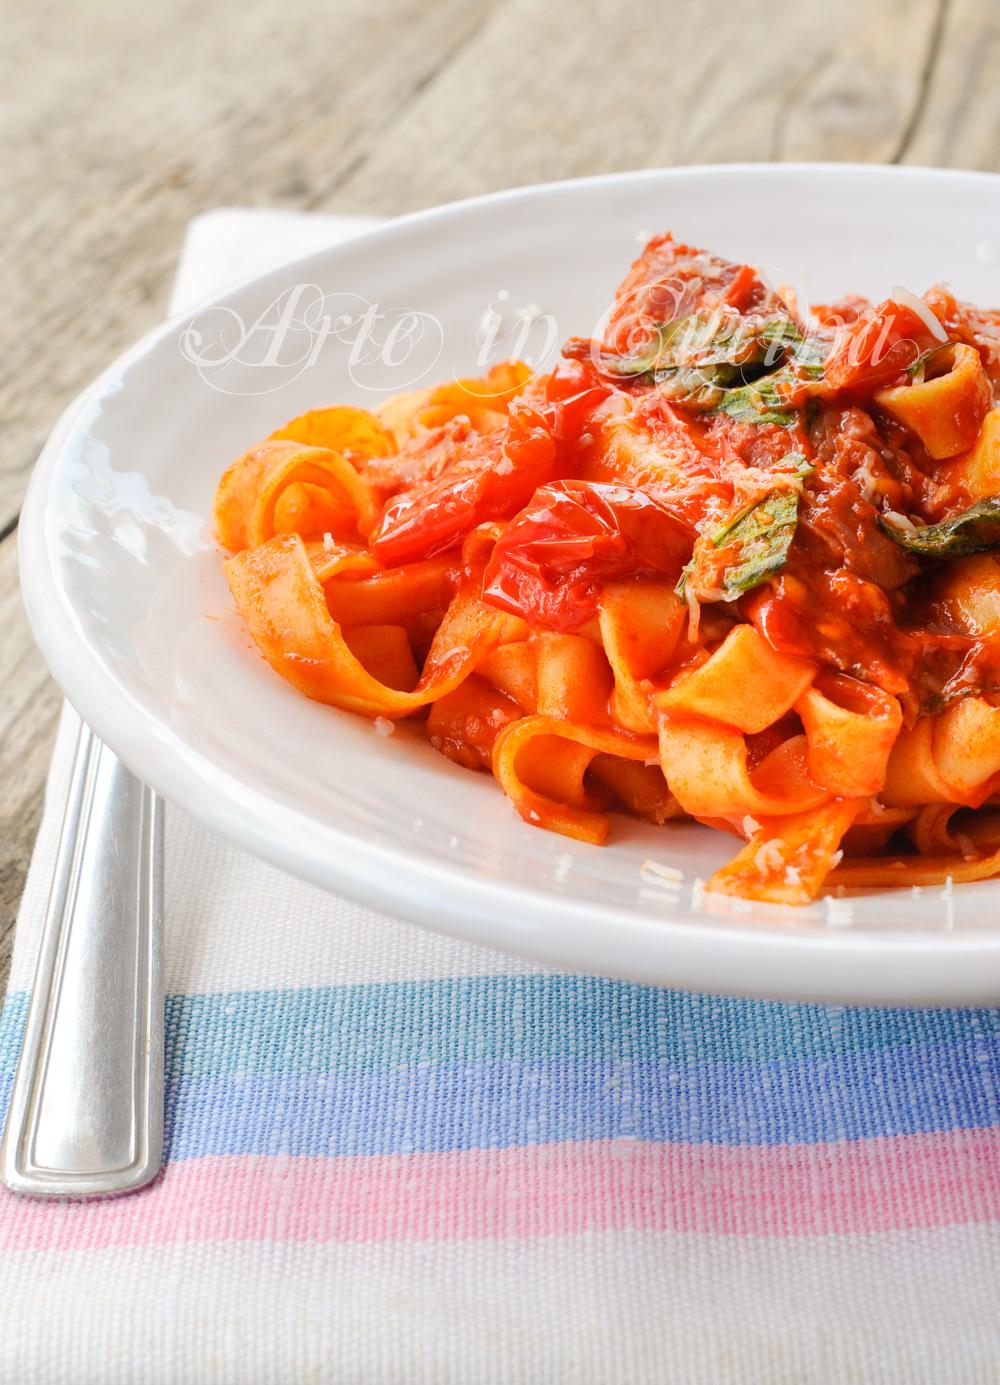 Fettuccine alla re Ferdinando II ricetta napoletana vickyart arte in cucina